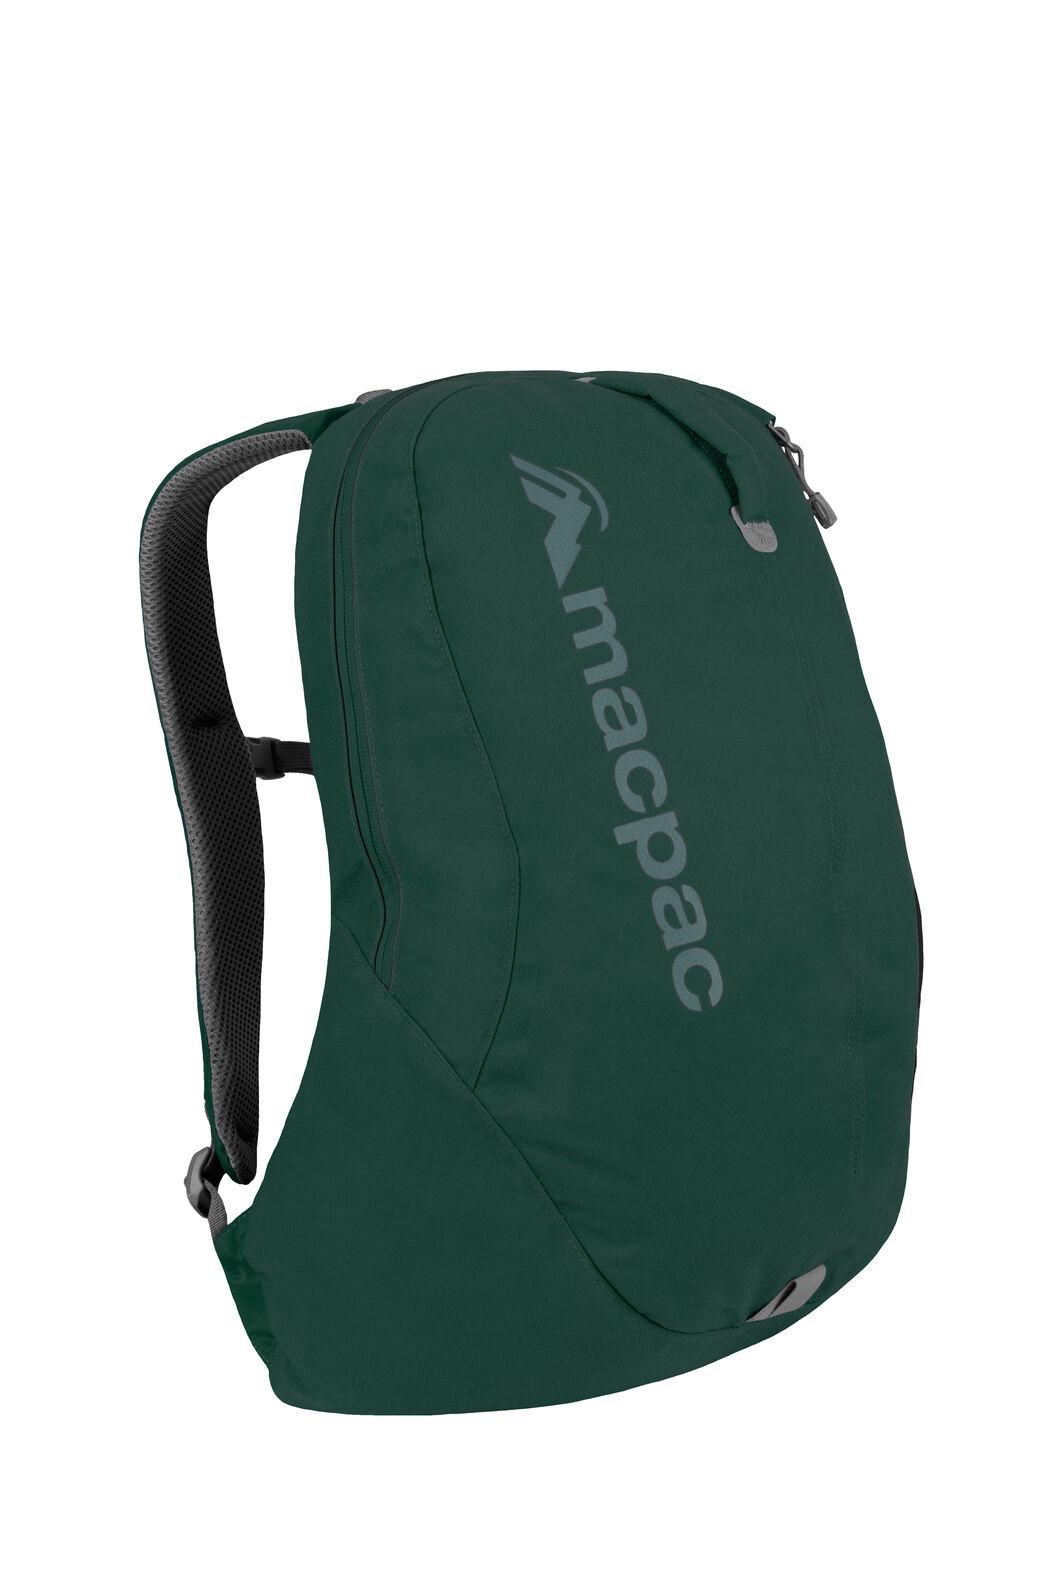 Macpac Kahu 22L AzTec® Backpack, Botanical Garden, hi-res